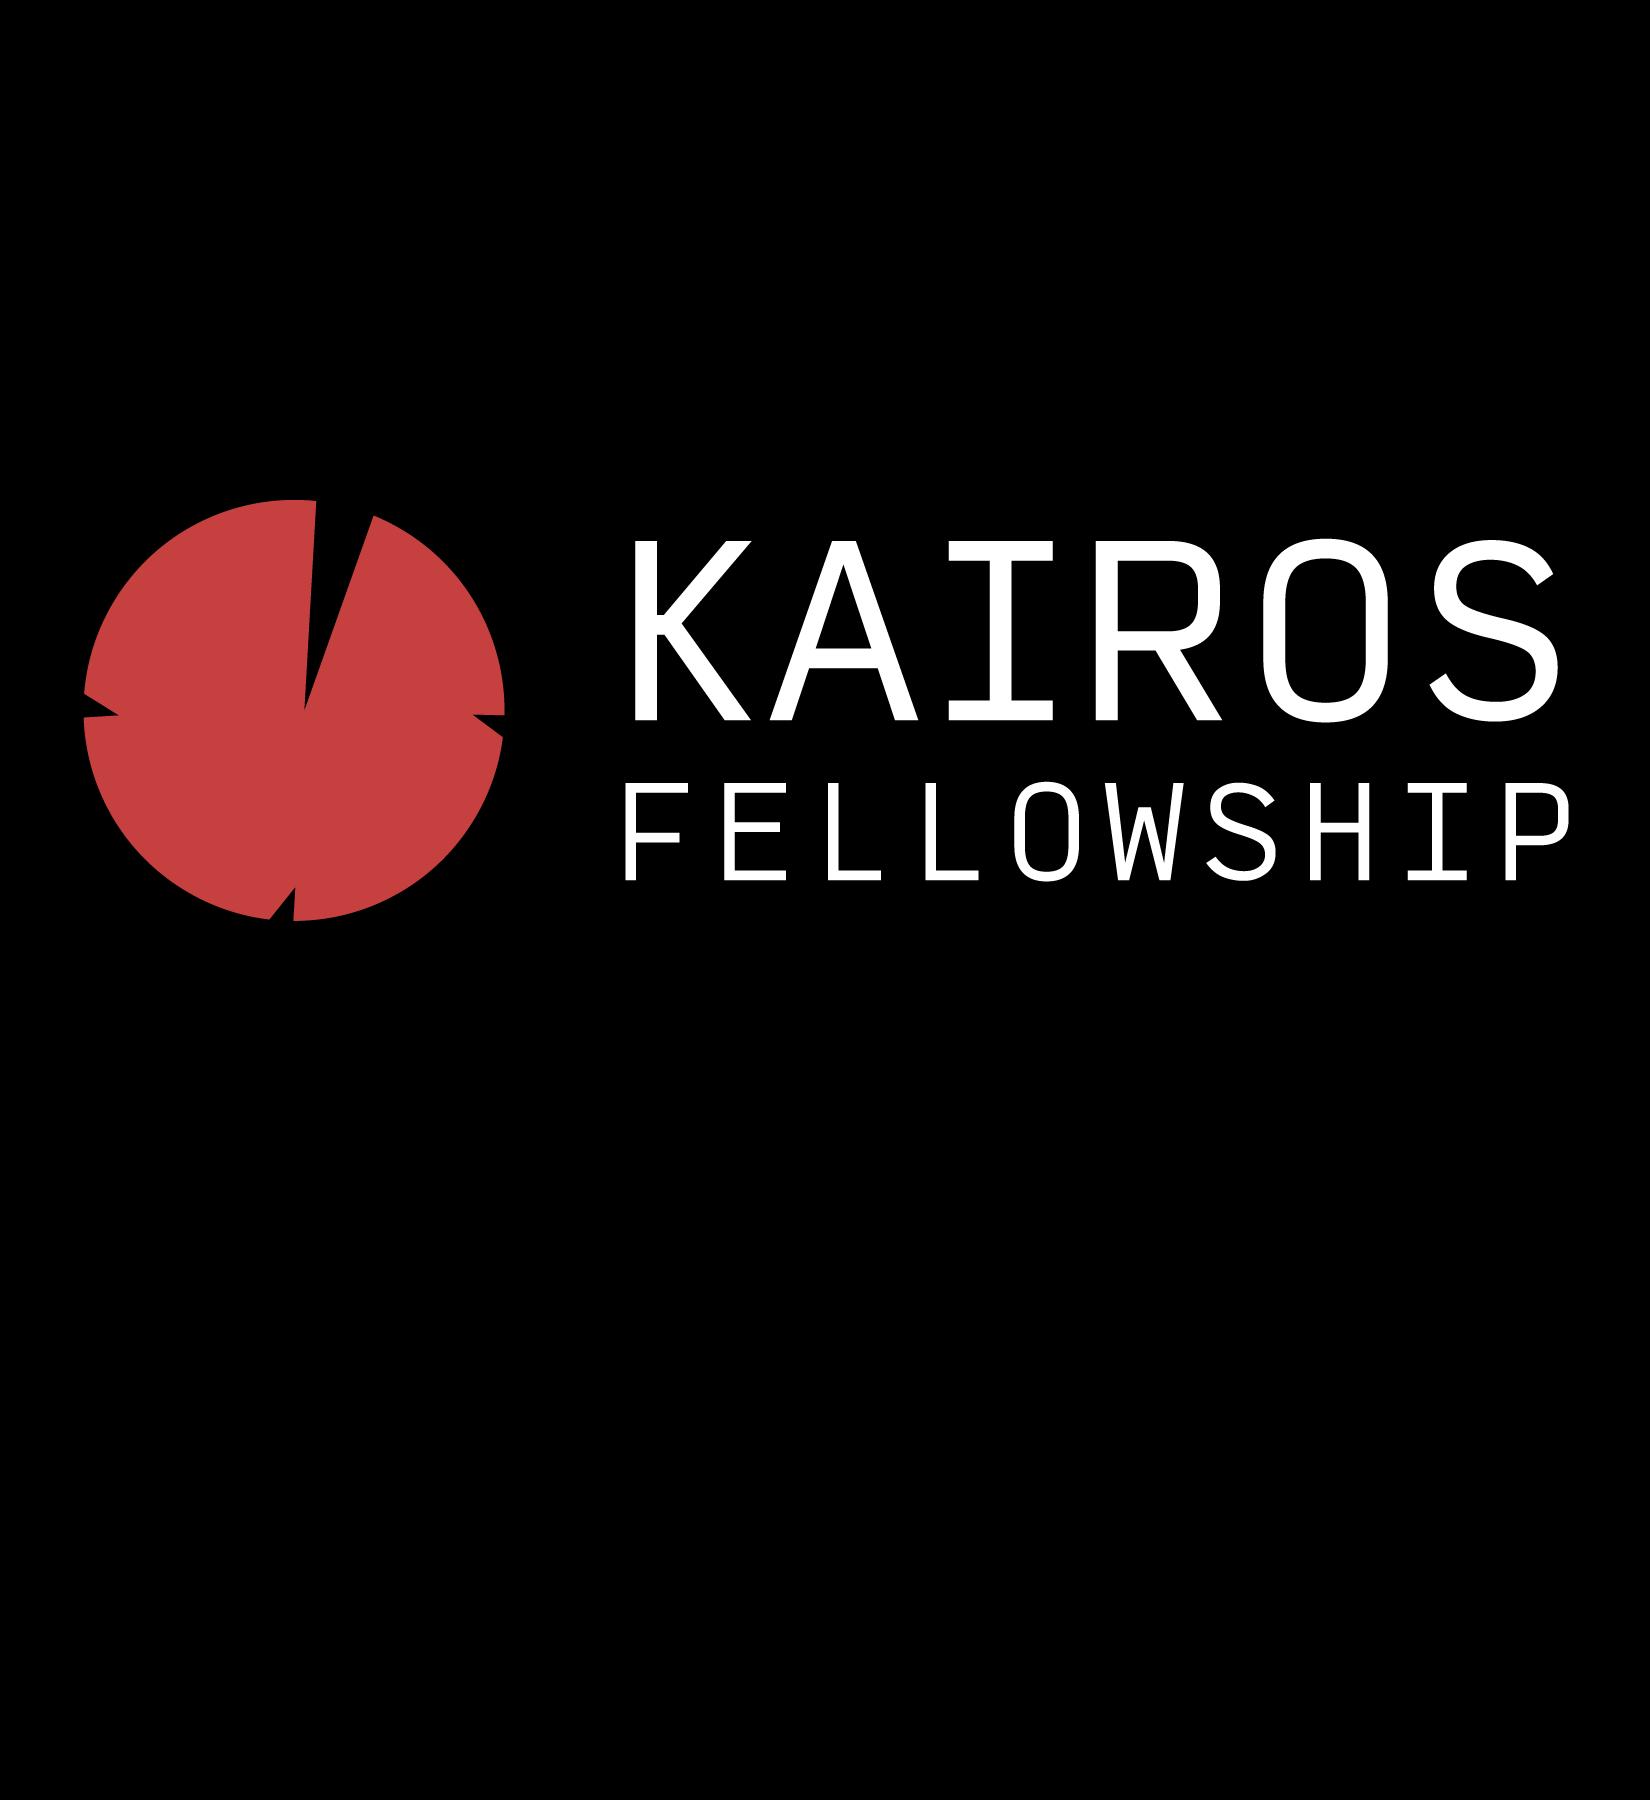 Kairos-Shirt-01.png